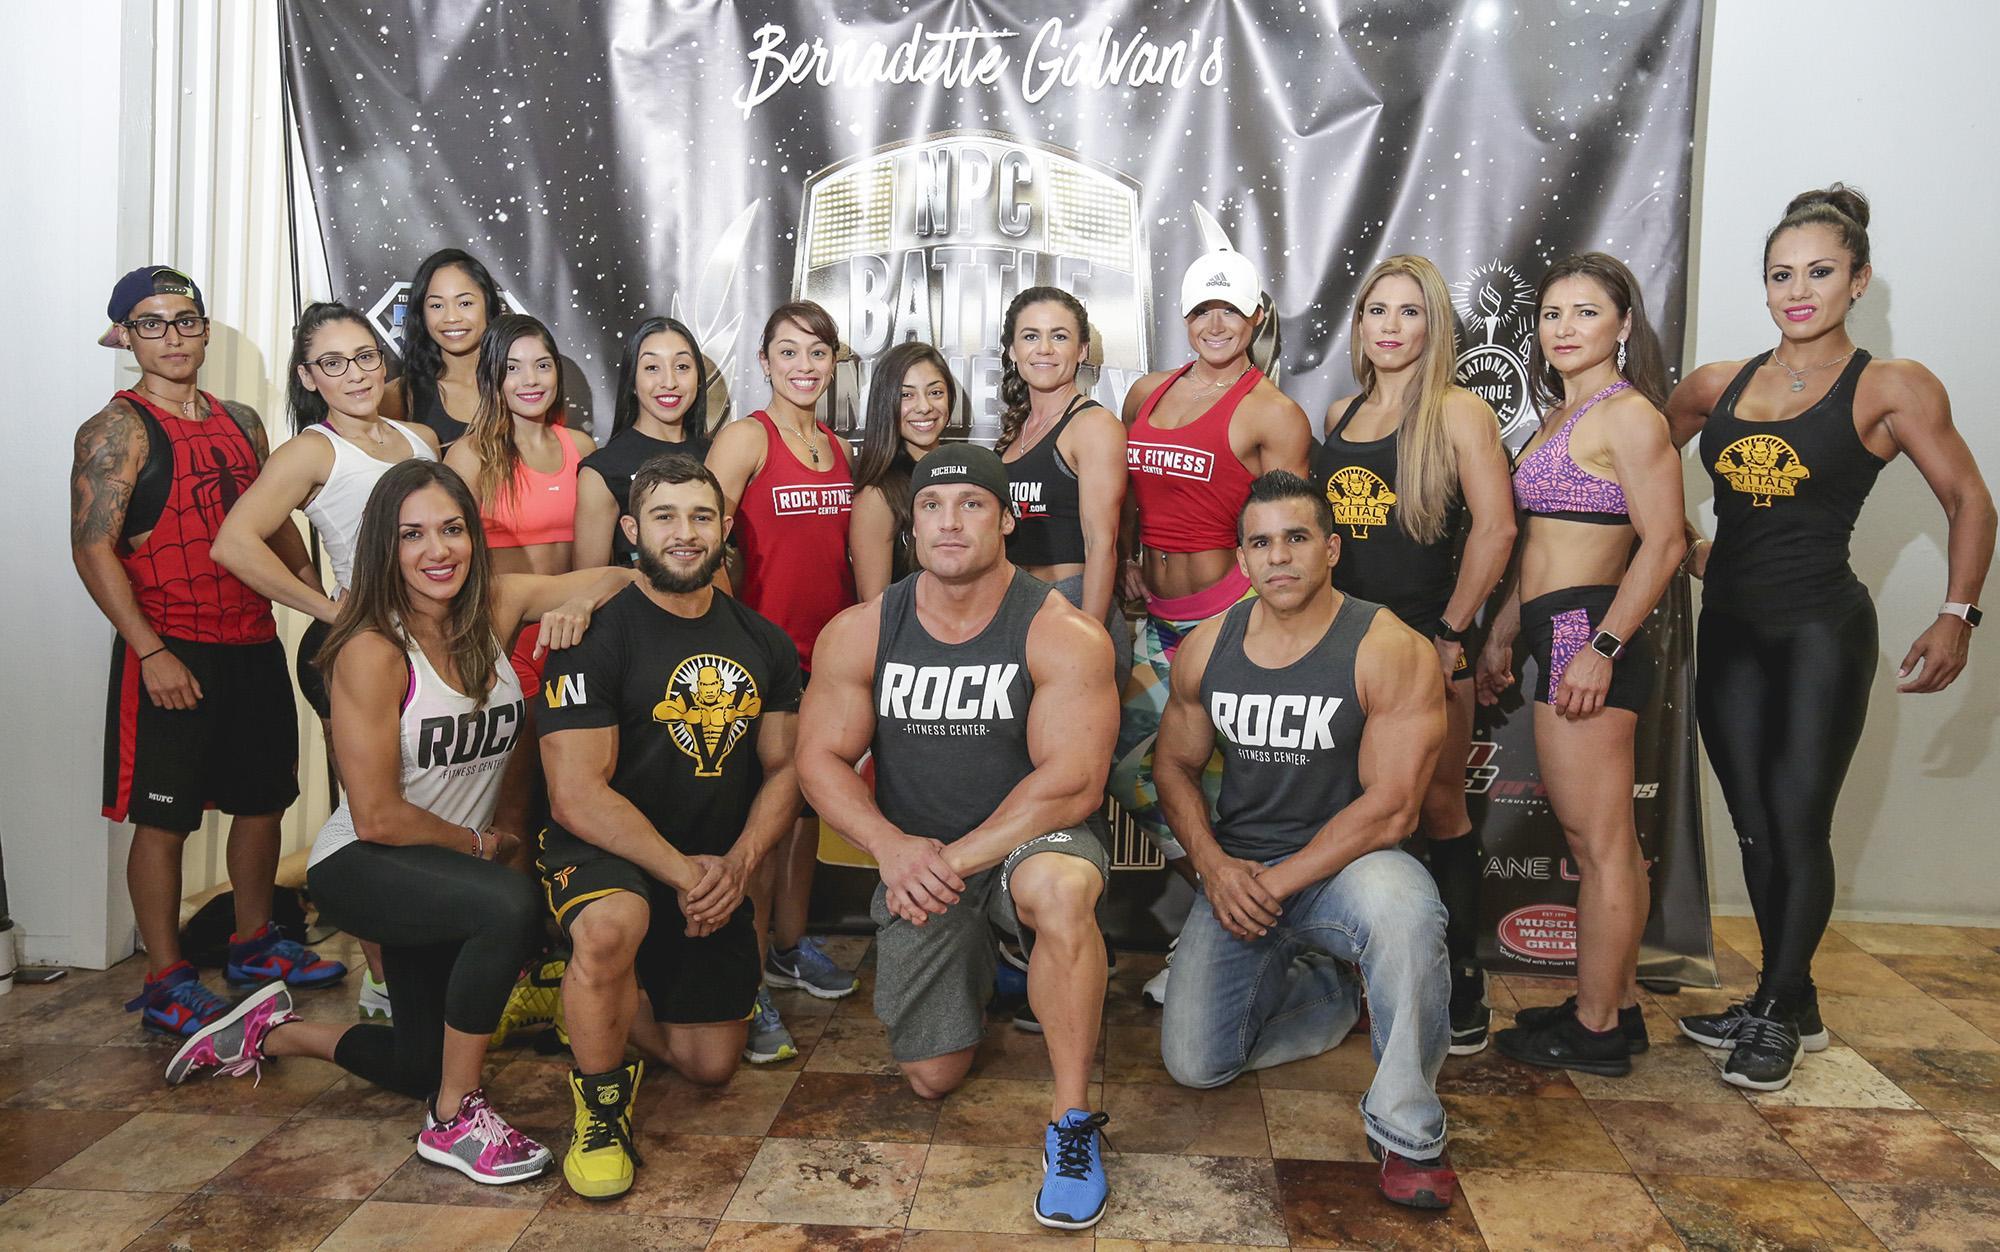 Local Fitness Center Hosts Battle Royale Event San